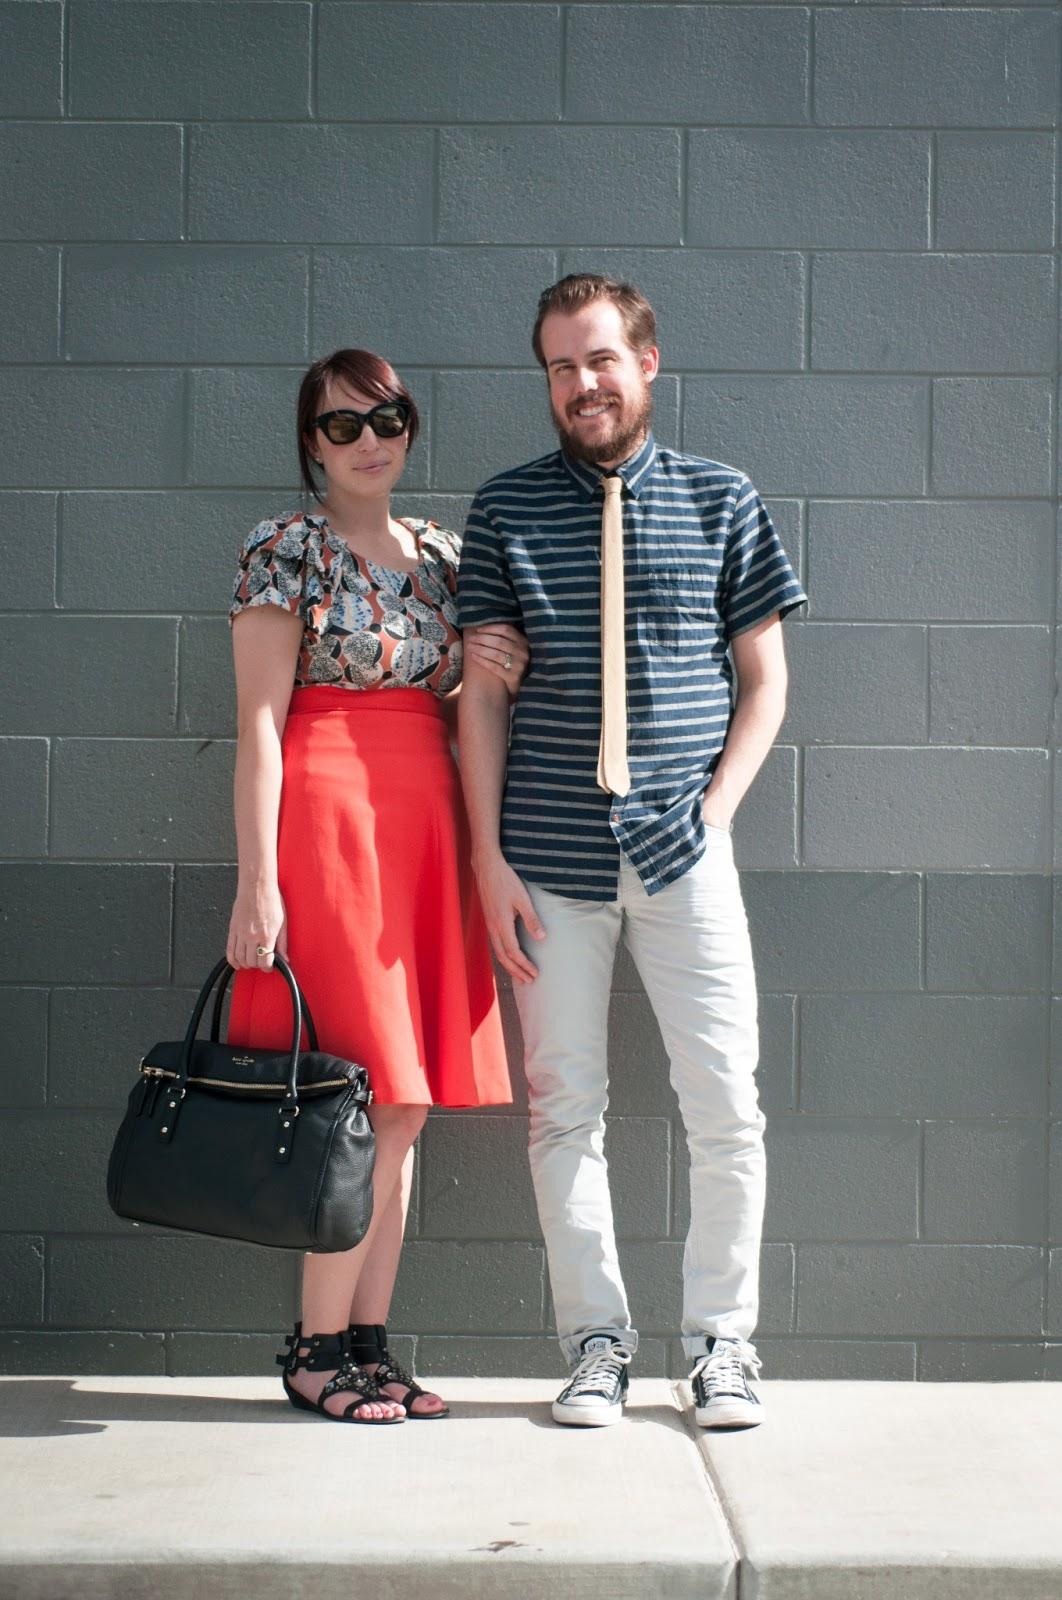 couples blog, ootd, fashion blog, style blog, mens style blog, mens fashion blog, kate spade new york, karen walker